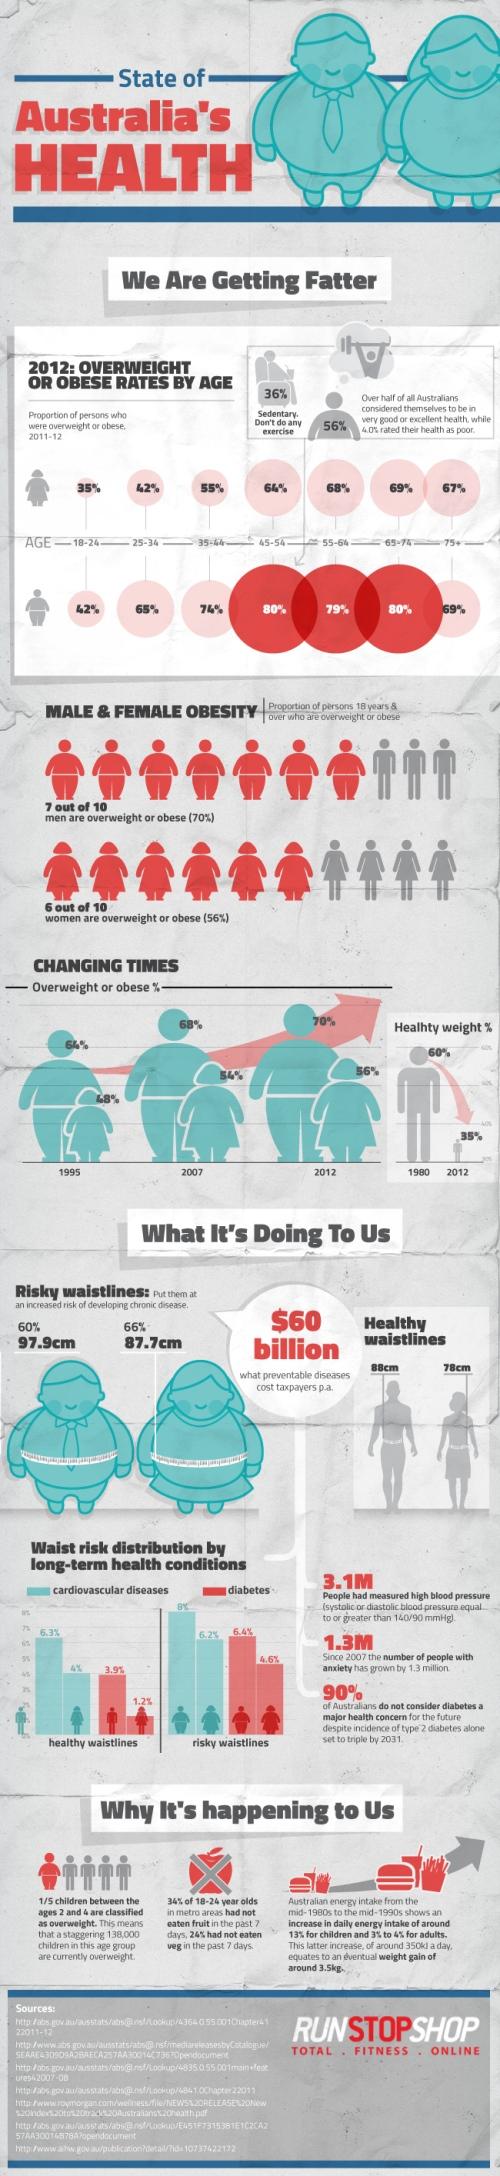 State of Australia's Health